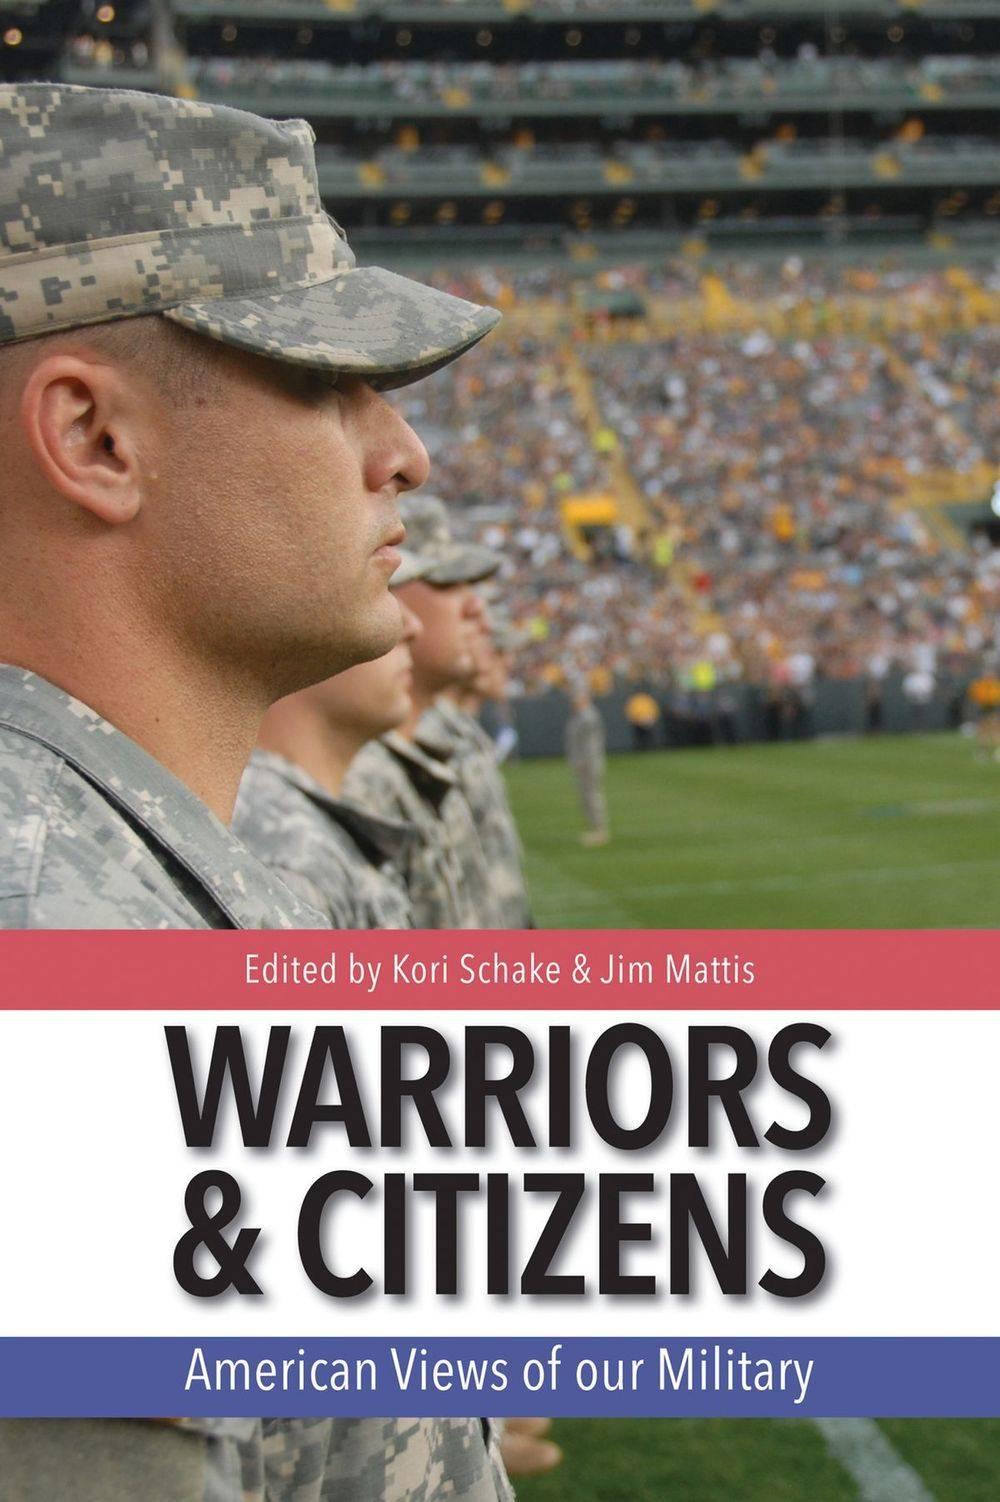 Warrior & Citizens, james mattis, jim mattis, kori schake